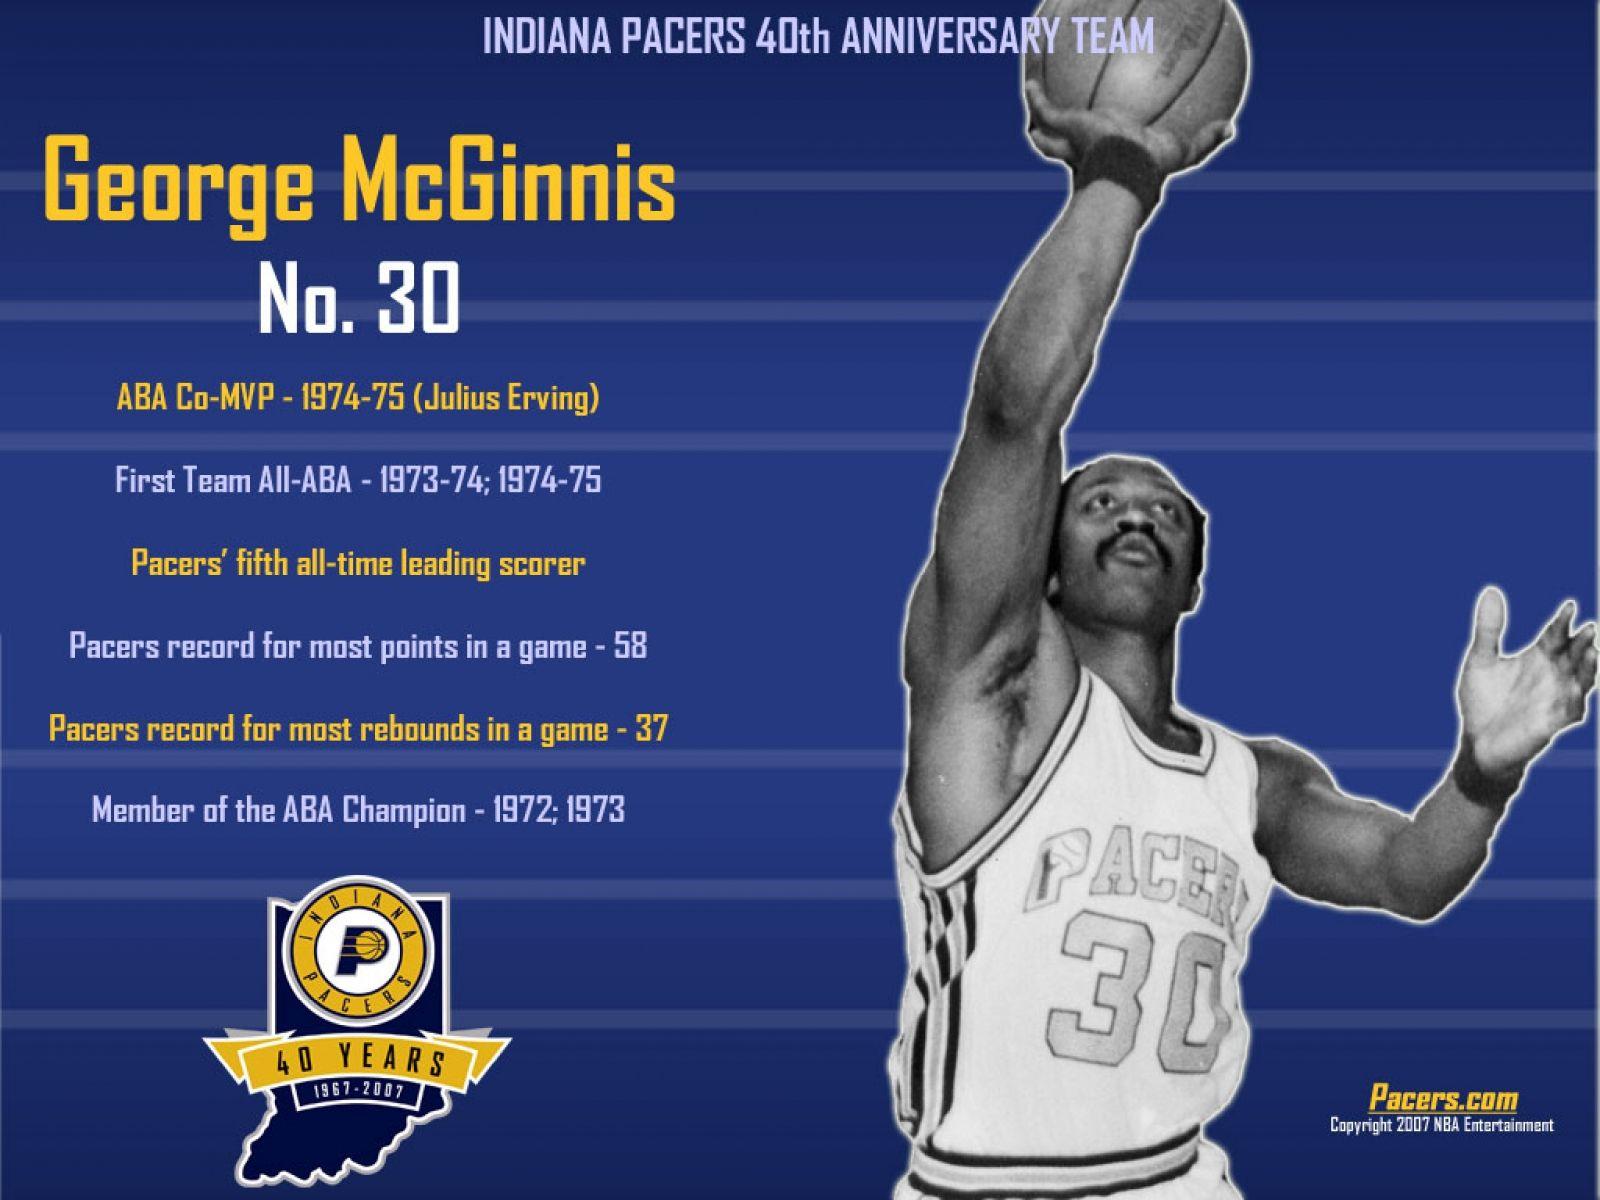 george mcginnis George Mcginnis LEGENDS OF THE NBA